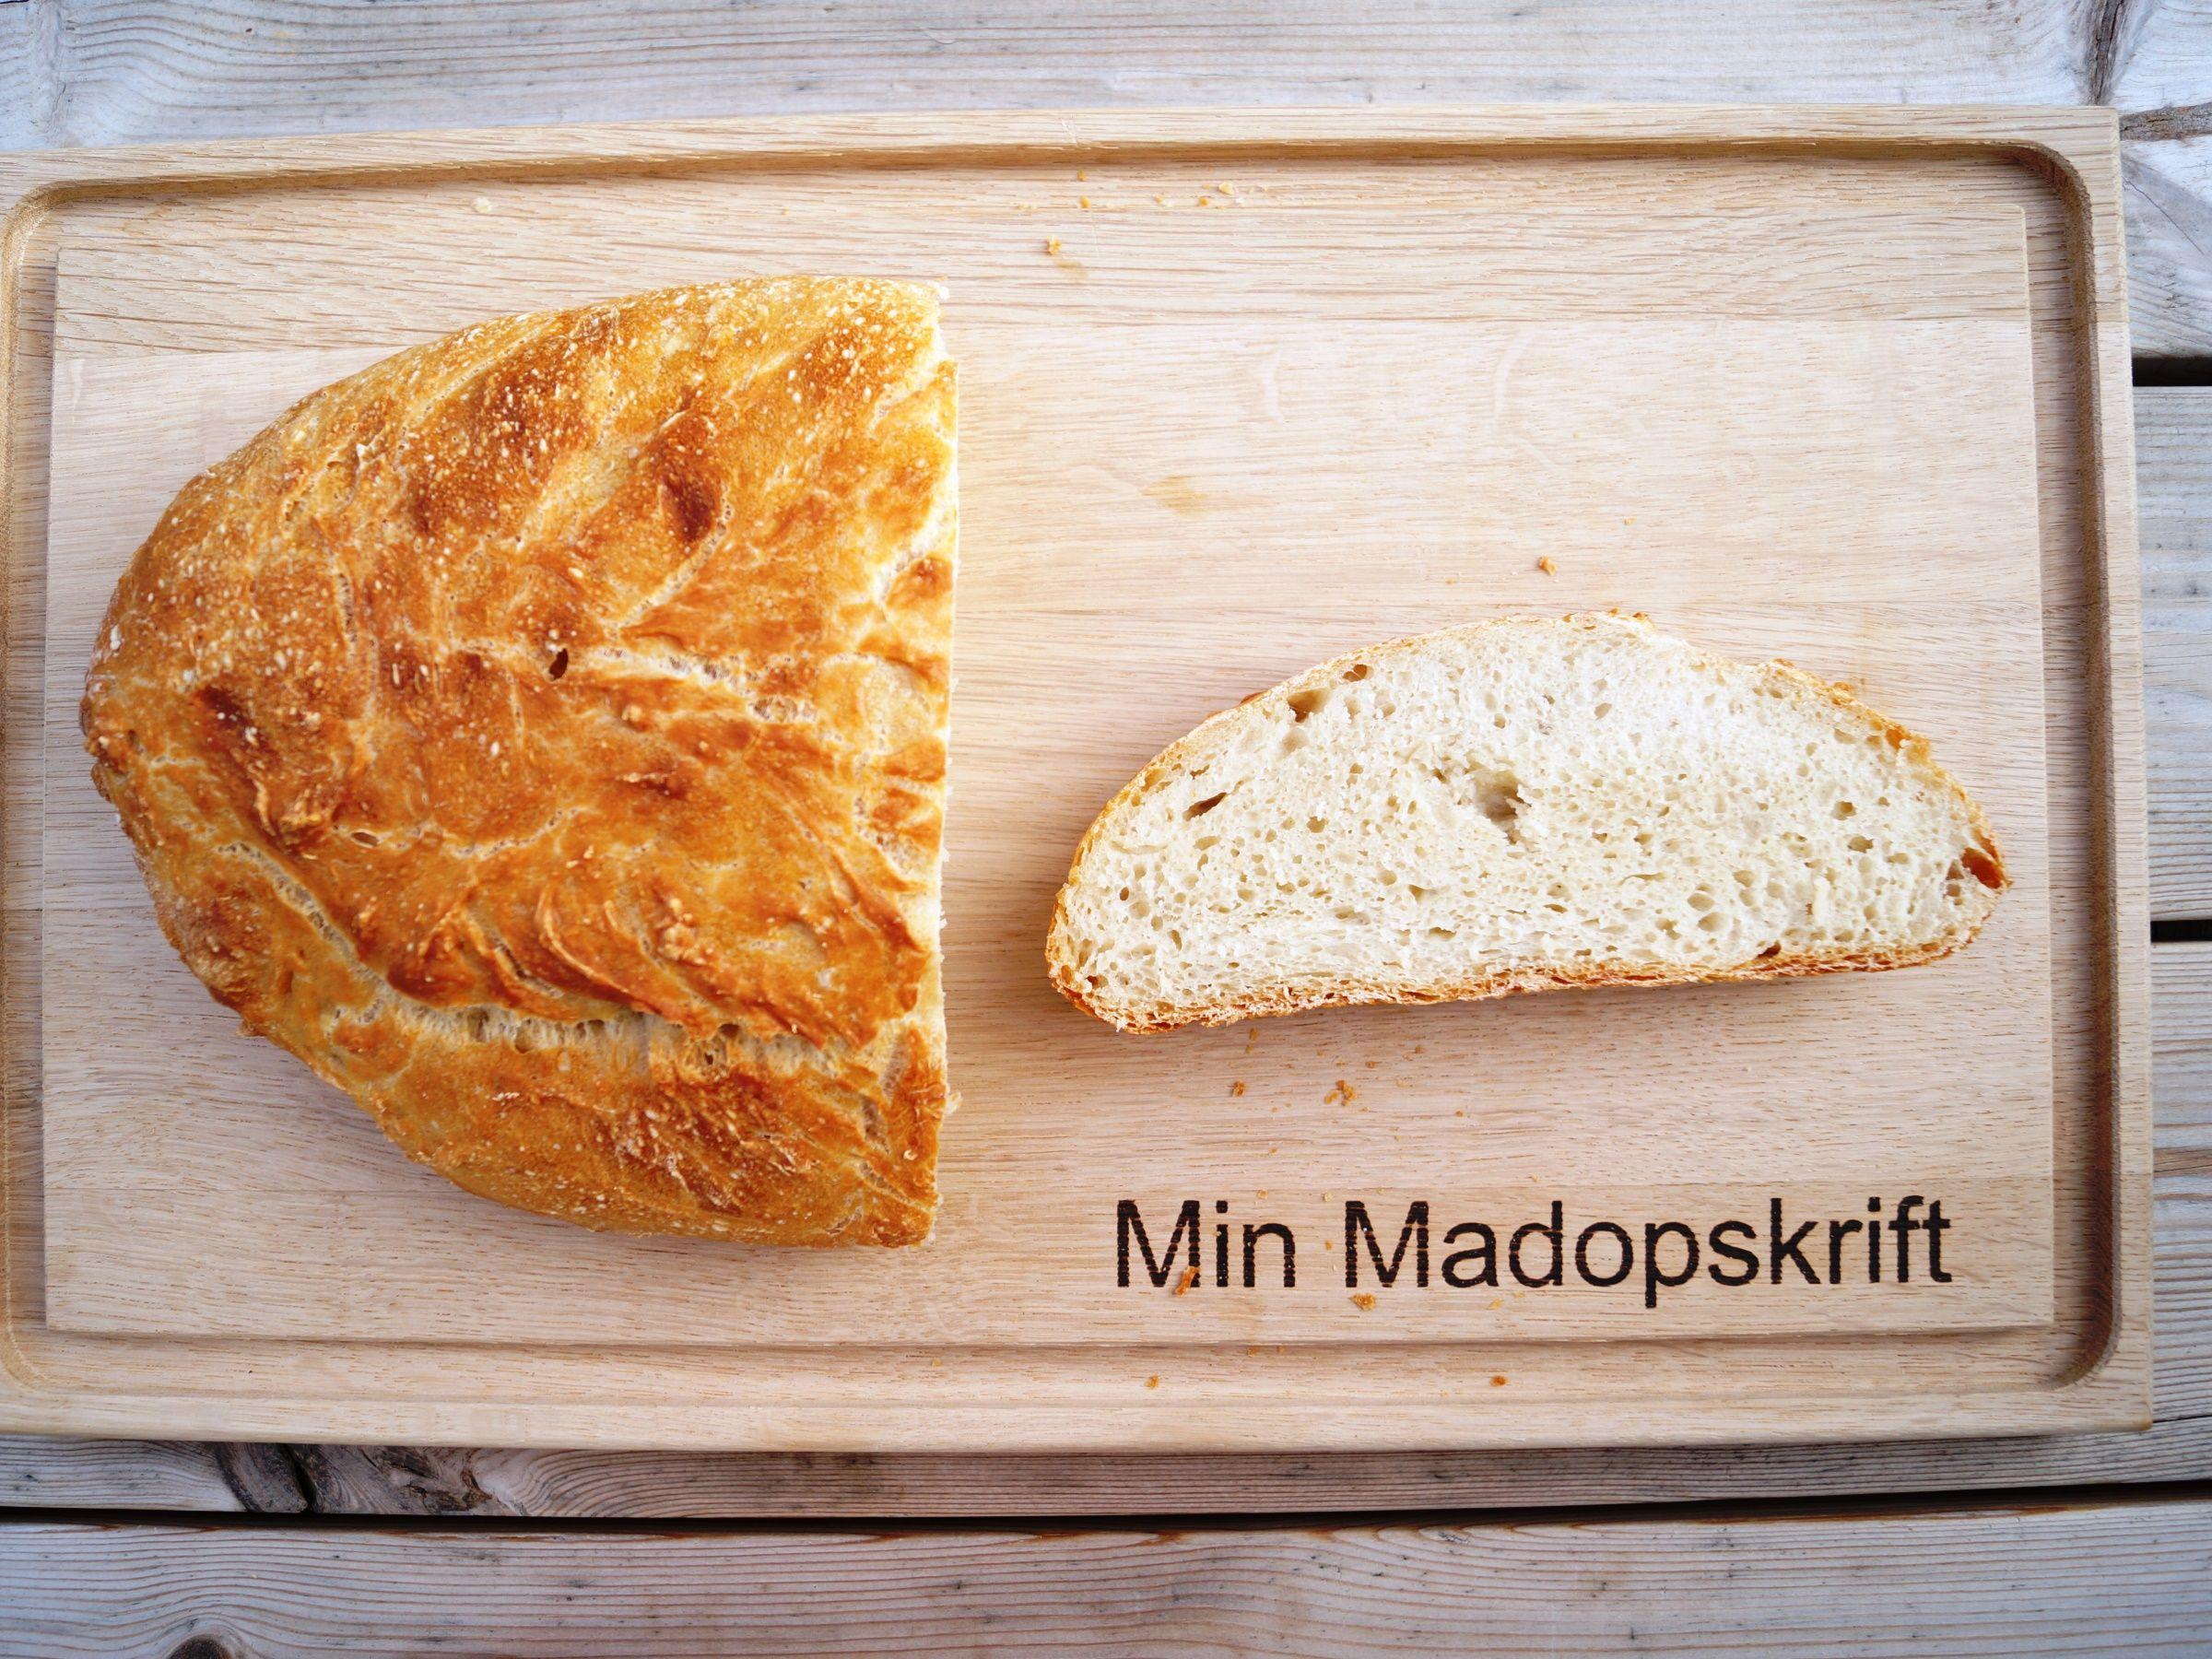 Manitobabrød